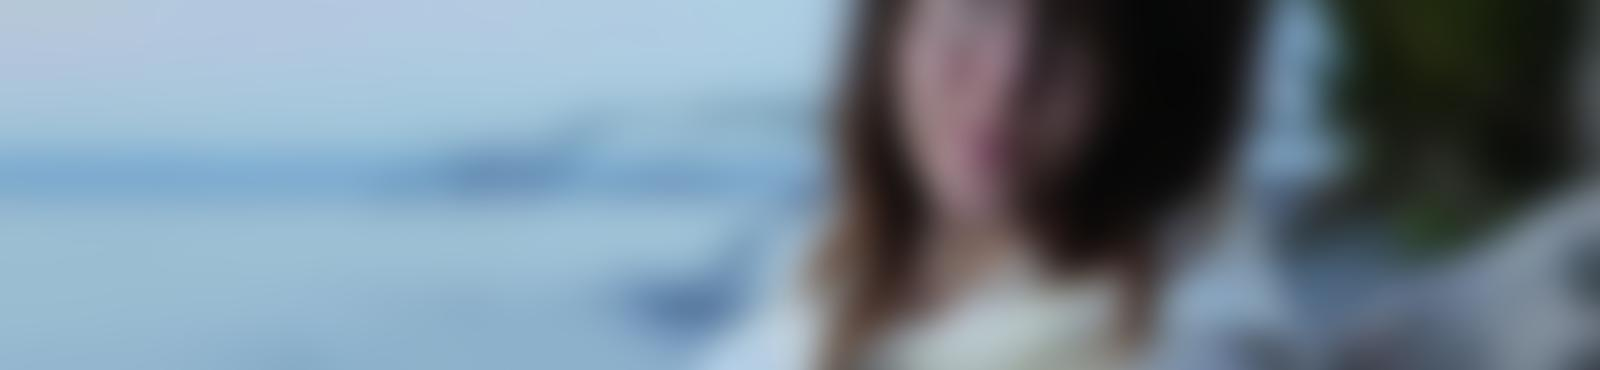 Blurred 8ae0fe53 7321 4c5d a039 0fd915c0ff59